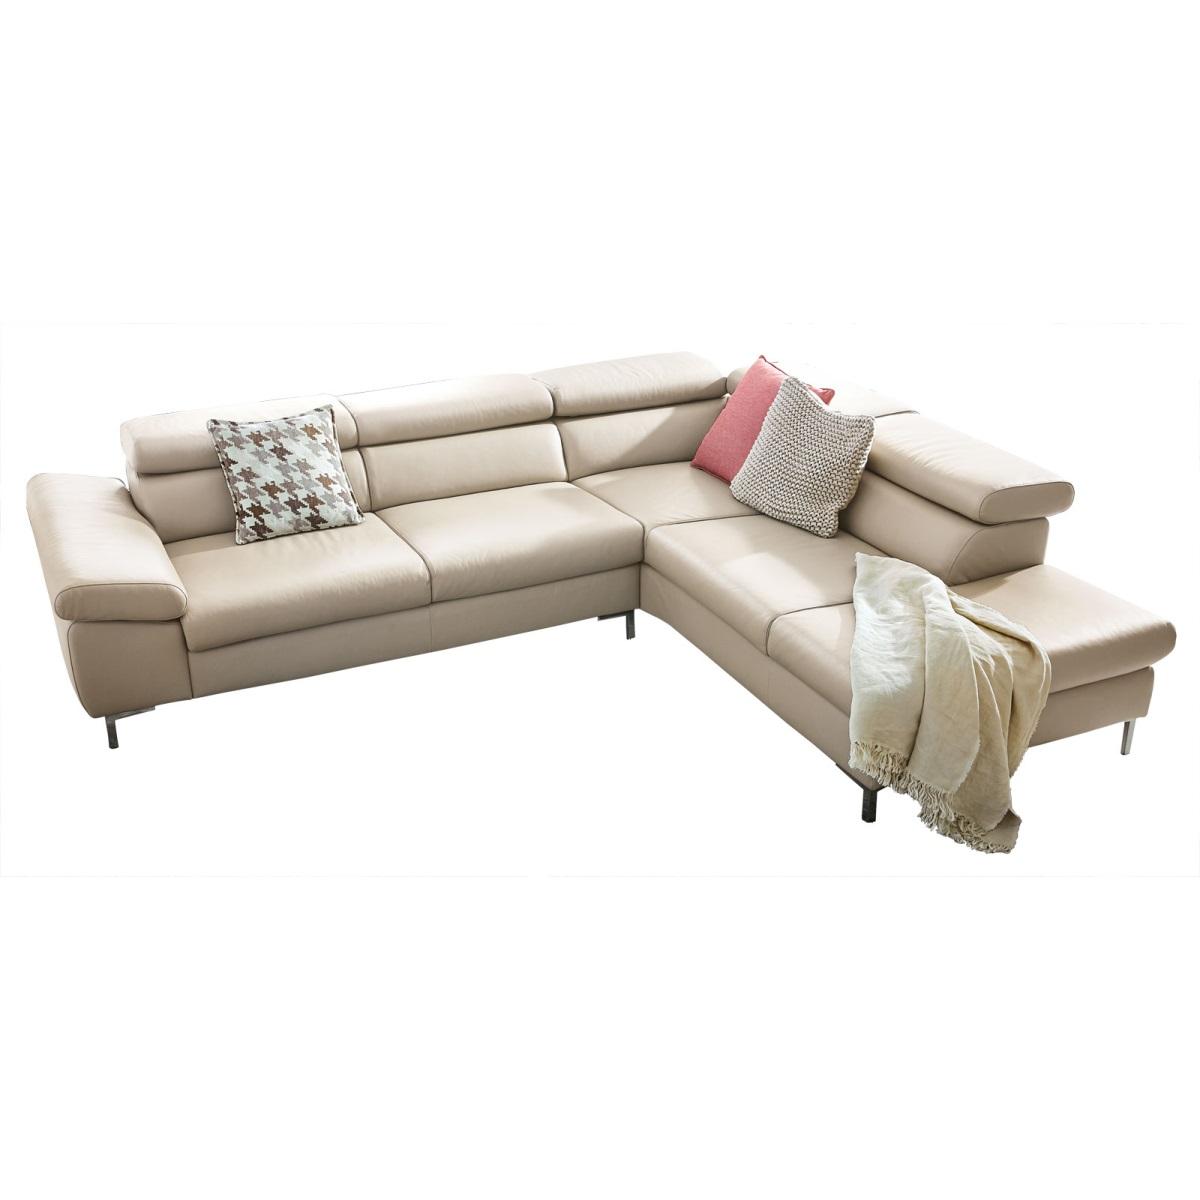 Full Size of Sofa Wschillig Ecksofa Kalbari 280 224 Cm Lederbezug Stonebeige Günstig Kaufen Spannbezug Mondo 3 Sitzer Leder Big Xxl Englisch Mit Hocker Lila Bezug Weißes Sofa W.schillig Sofa